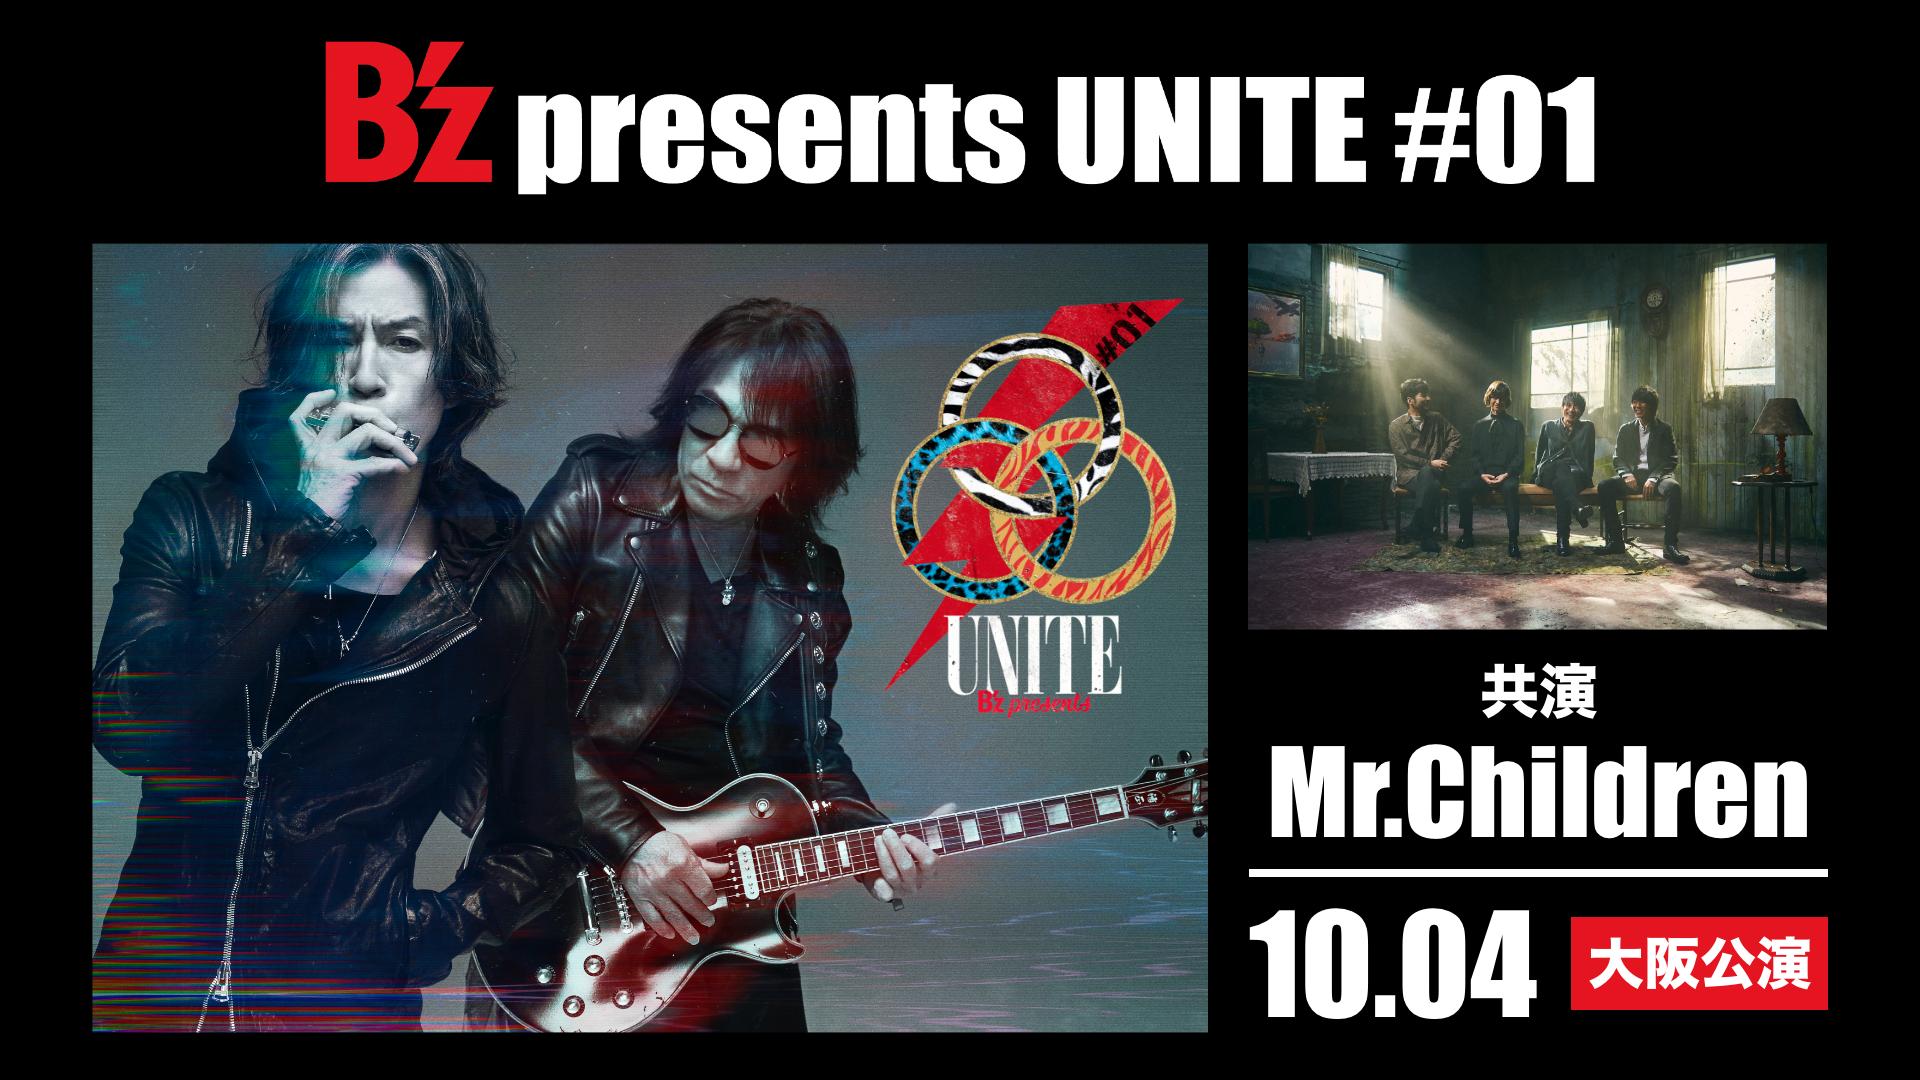 B'z presents UNITE #01 (大阪公演)の画像